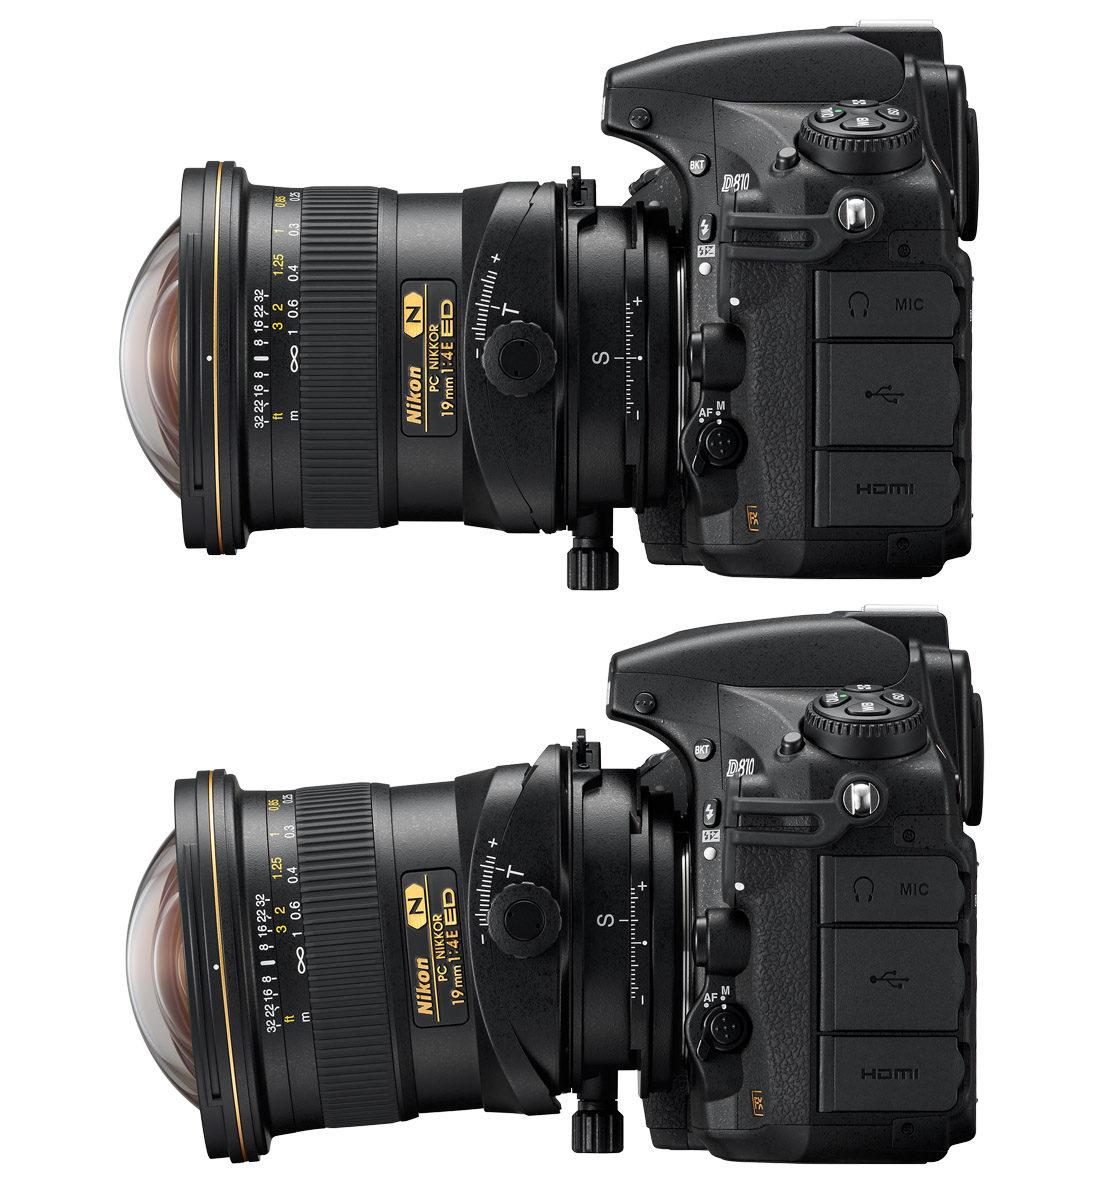 nikon-pc-19mm-f4-e-ed-vidvinkelobjektiv-med-perspektivkontroll